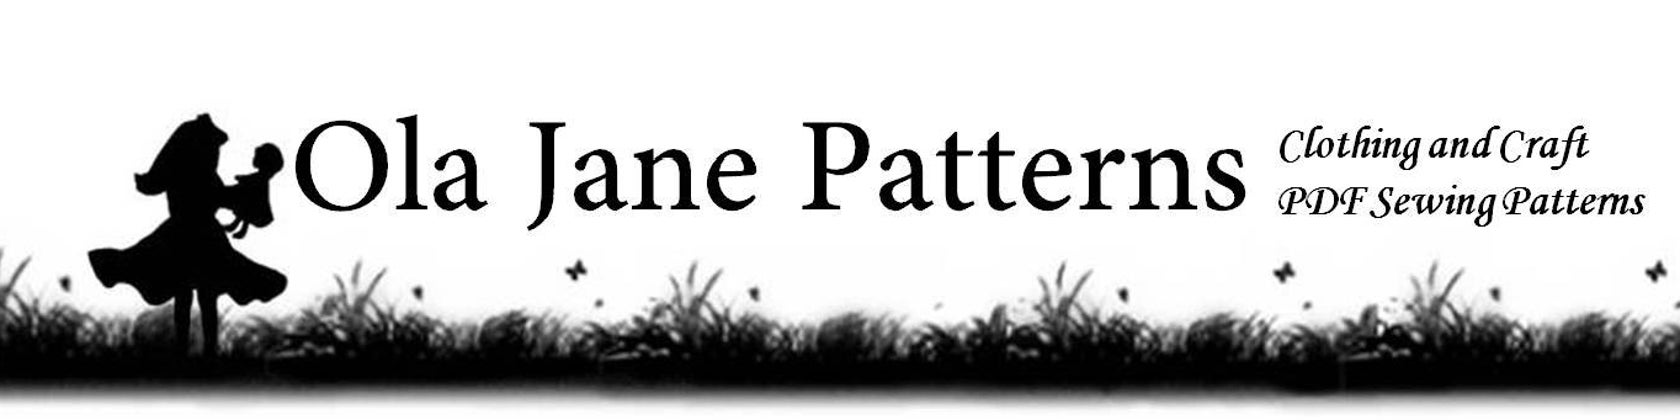 Pillowcase dress pattern children clothing pdf by olajanepatterns olajanepatterns fandeluxe Images